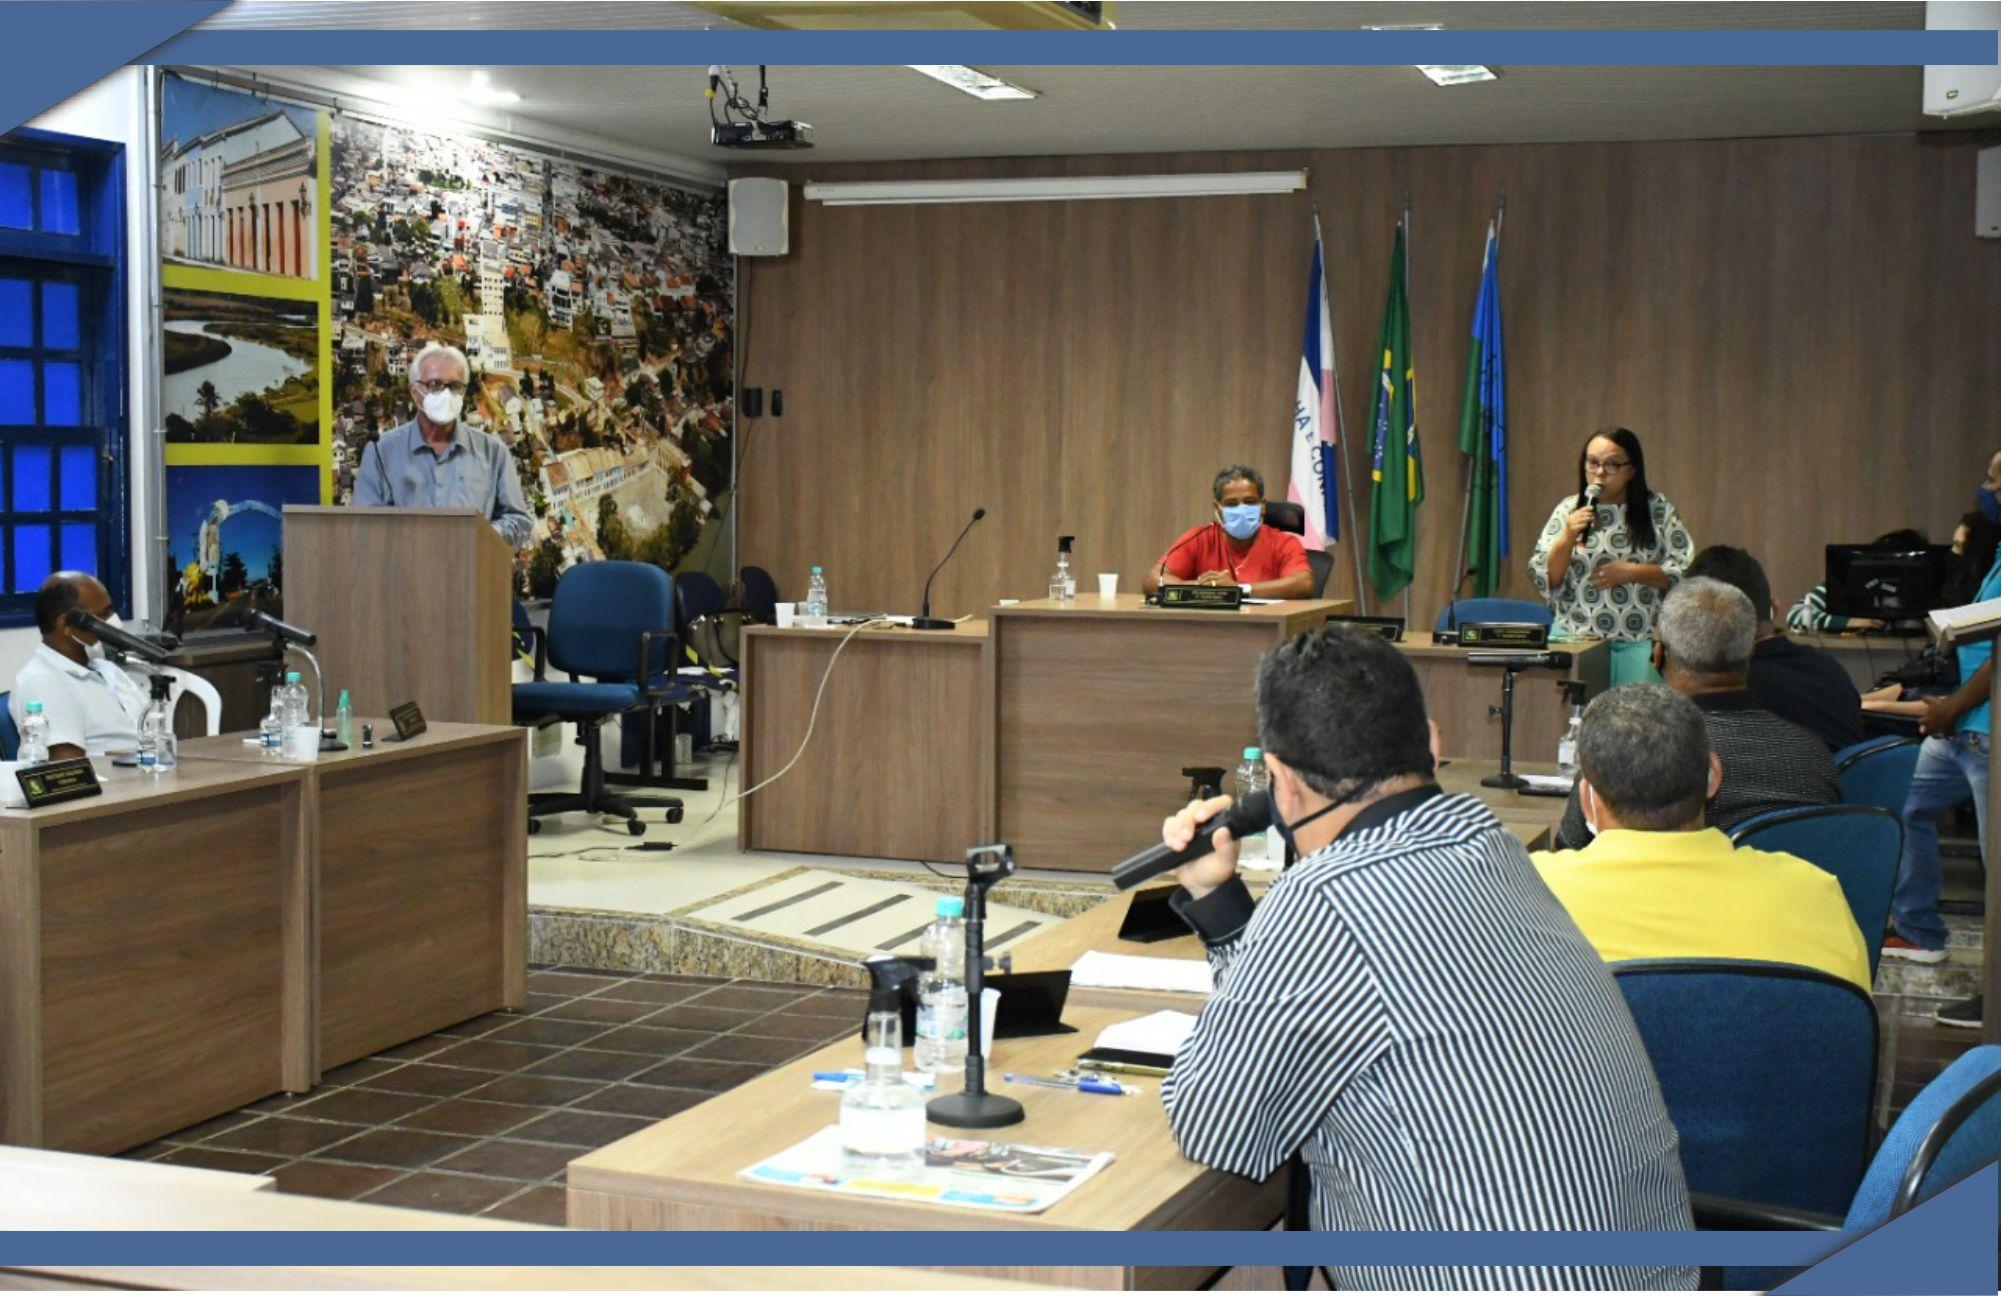 SECRETARIA MUNICIPAL DE FINANÇAS PRESTANDO CONTAS: MUNICÍPIO CUMPRIU AS METAS